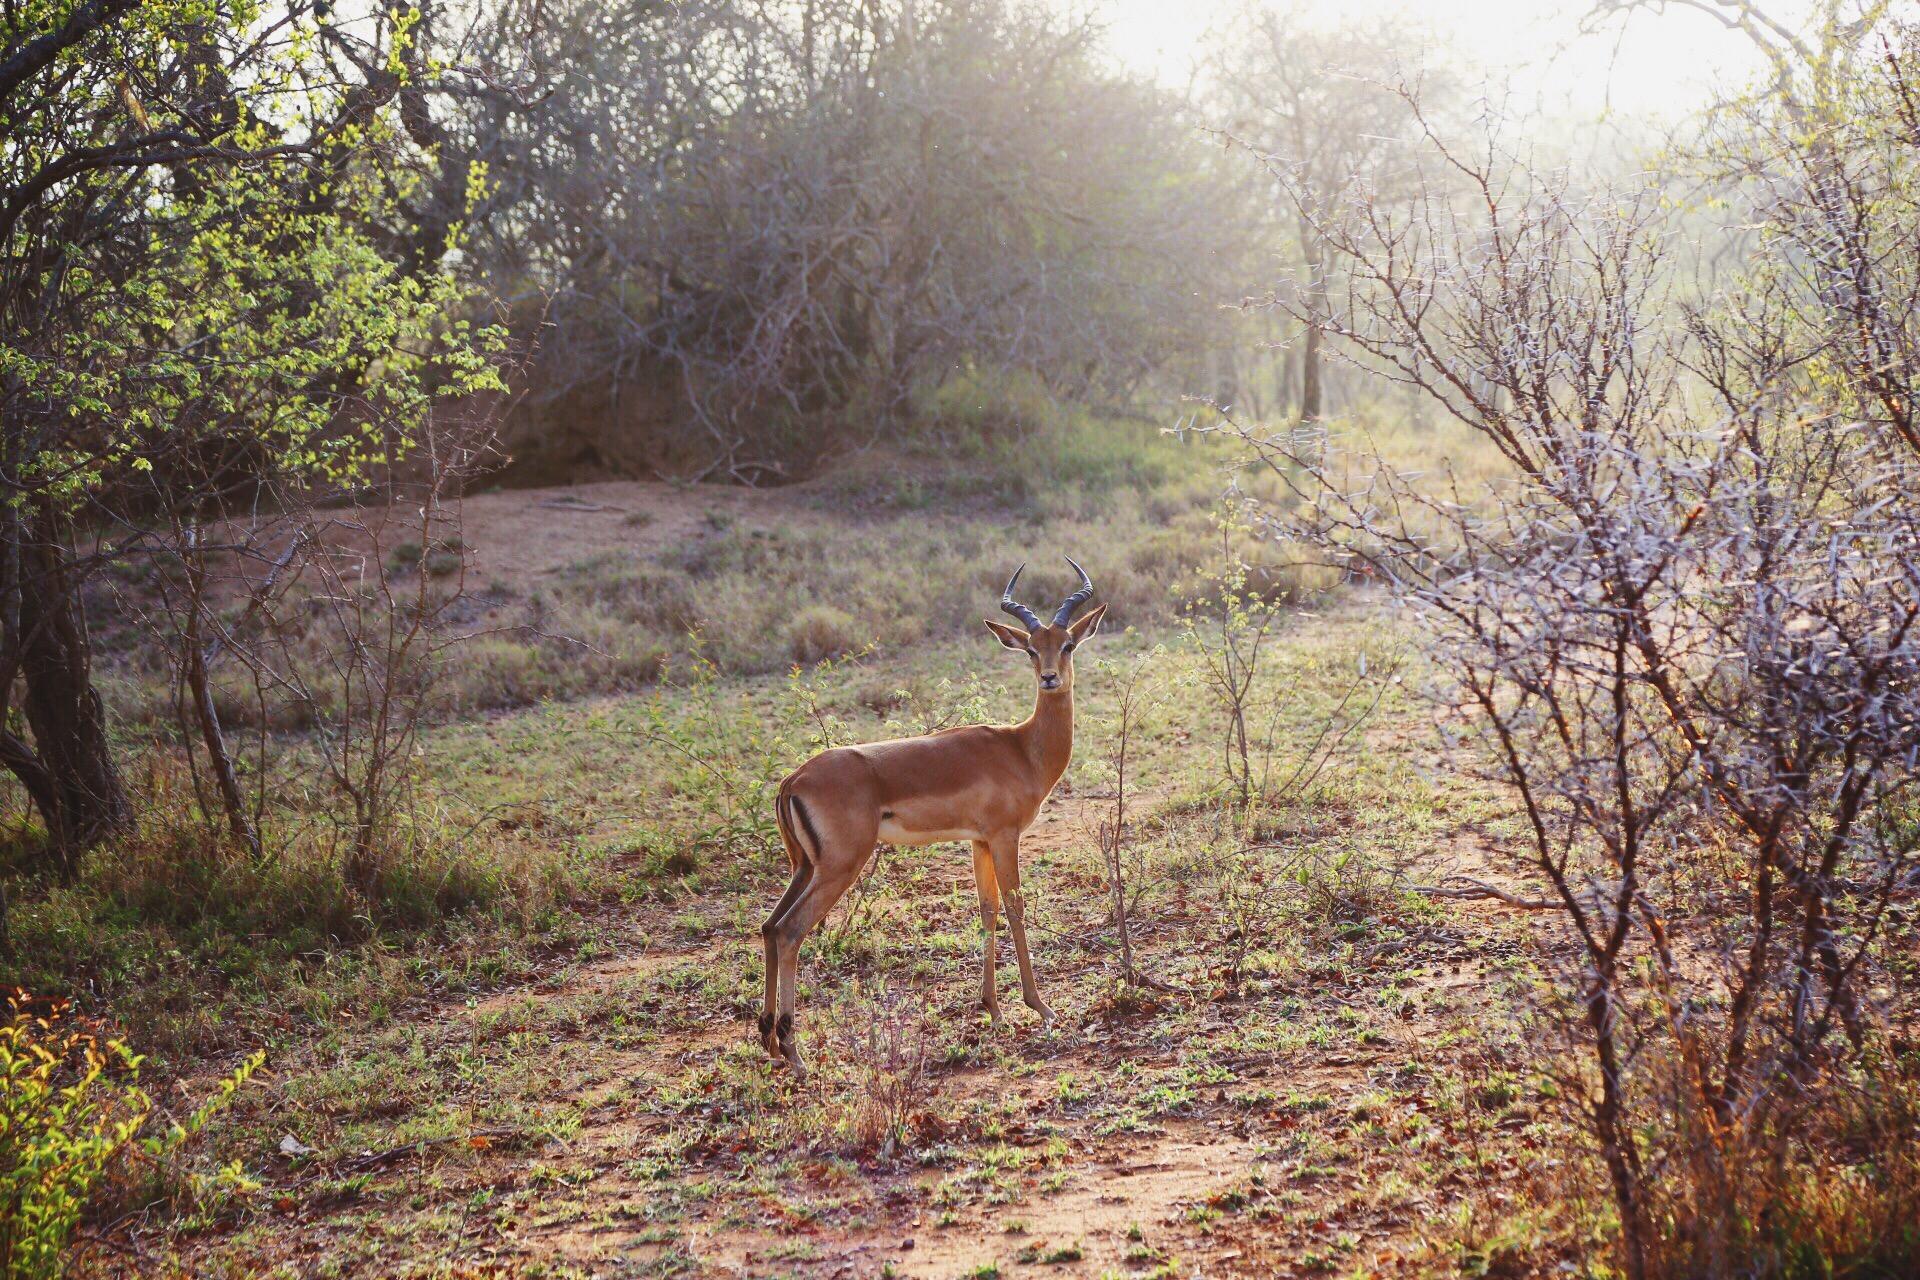 Safari In South Africa - A Photo Diary (16)